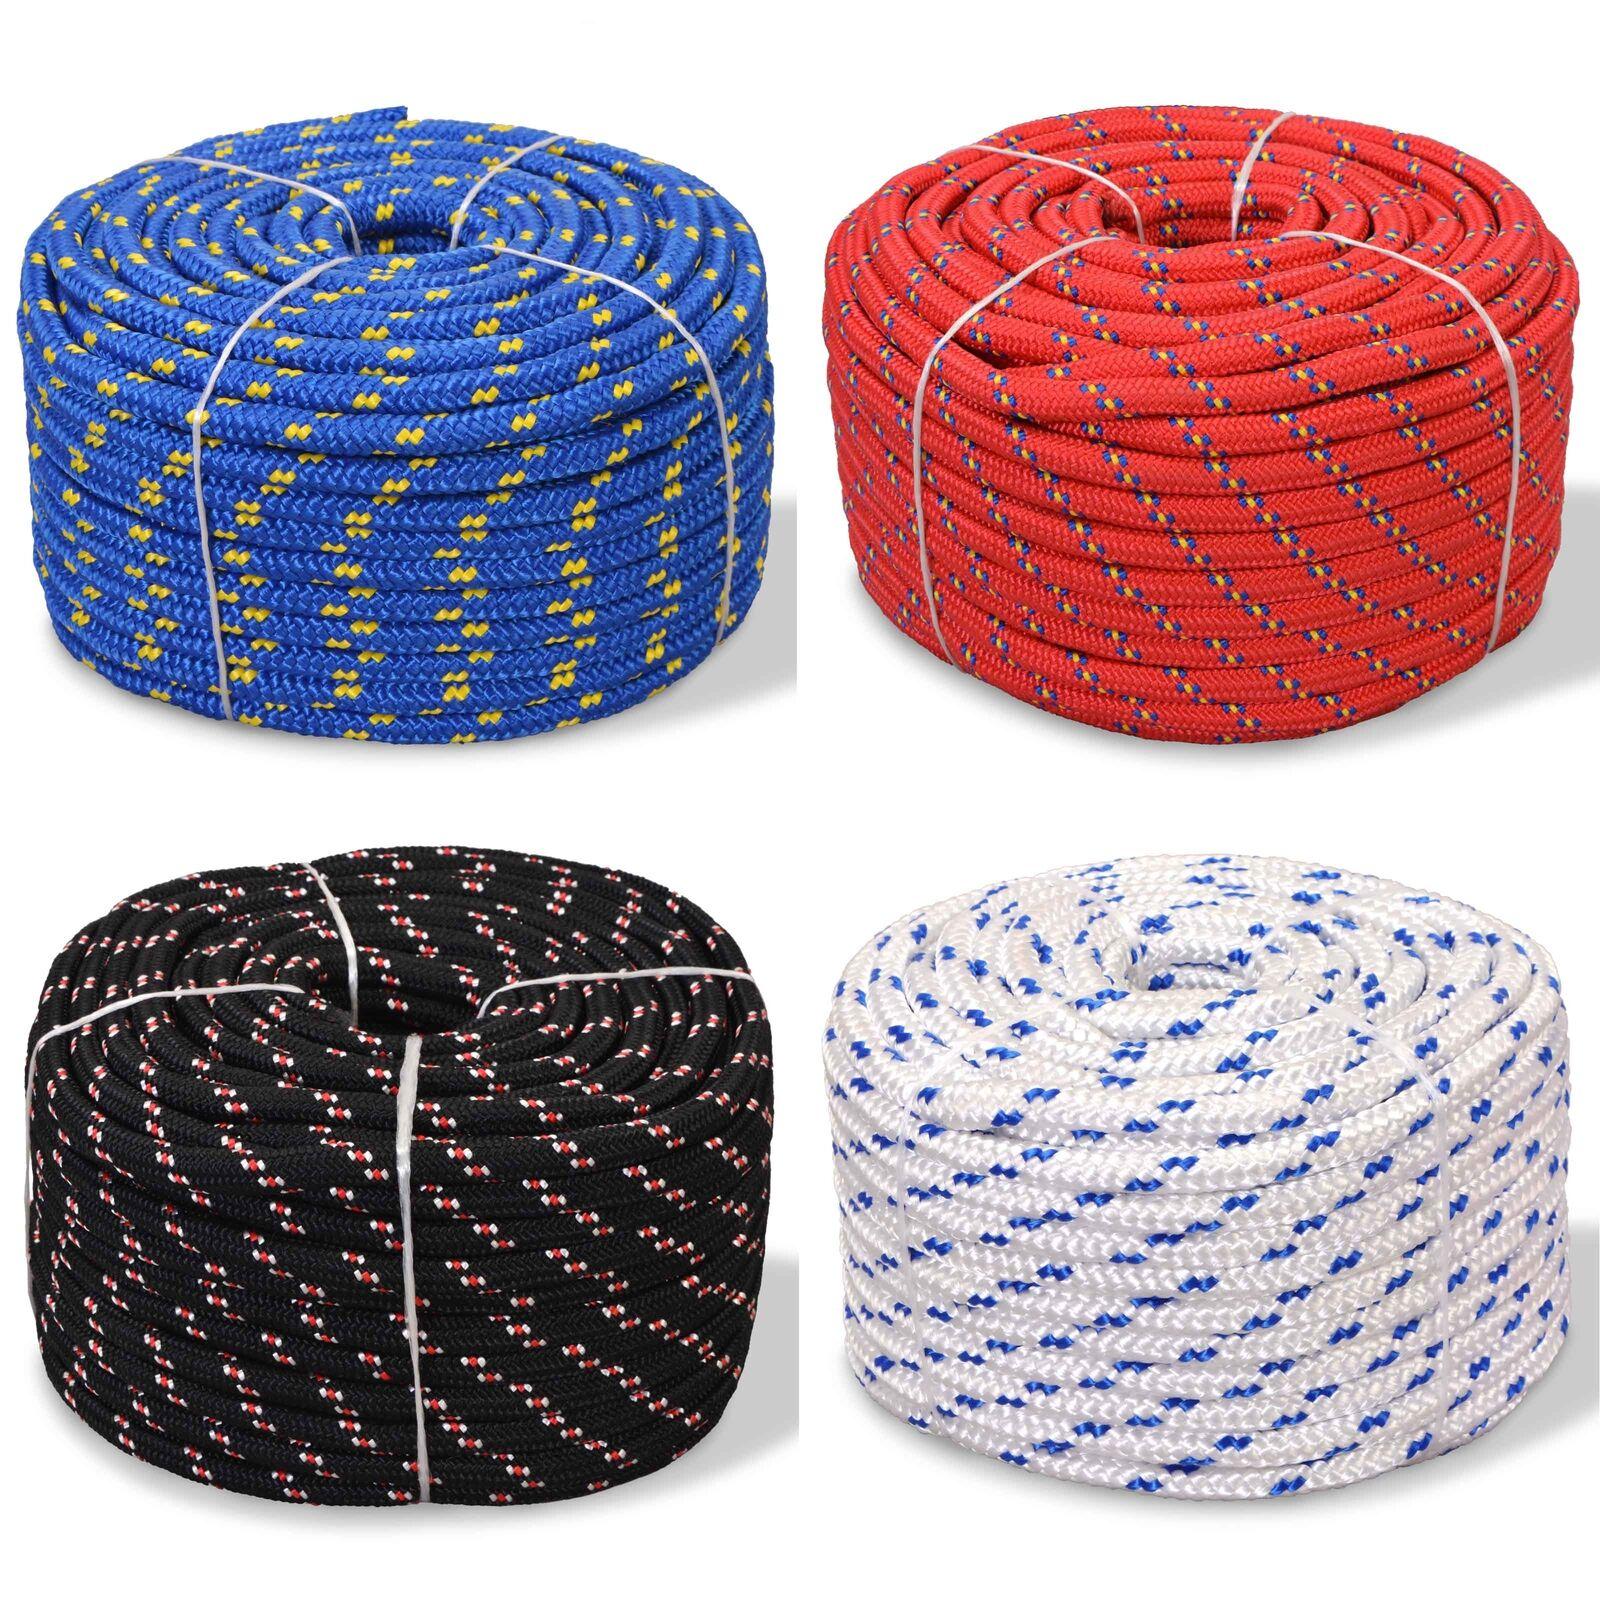 VidaXL Marine Rope Polypropylene Weatherproof Swing Multi Sizes Multi Colours